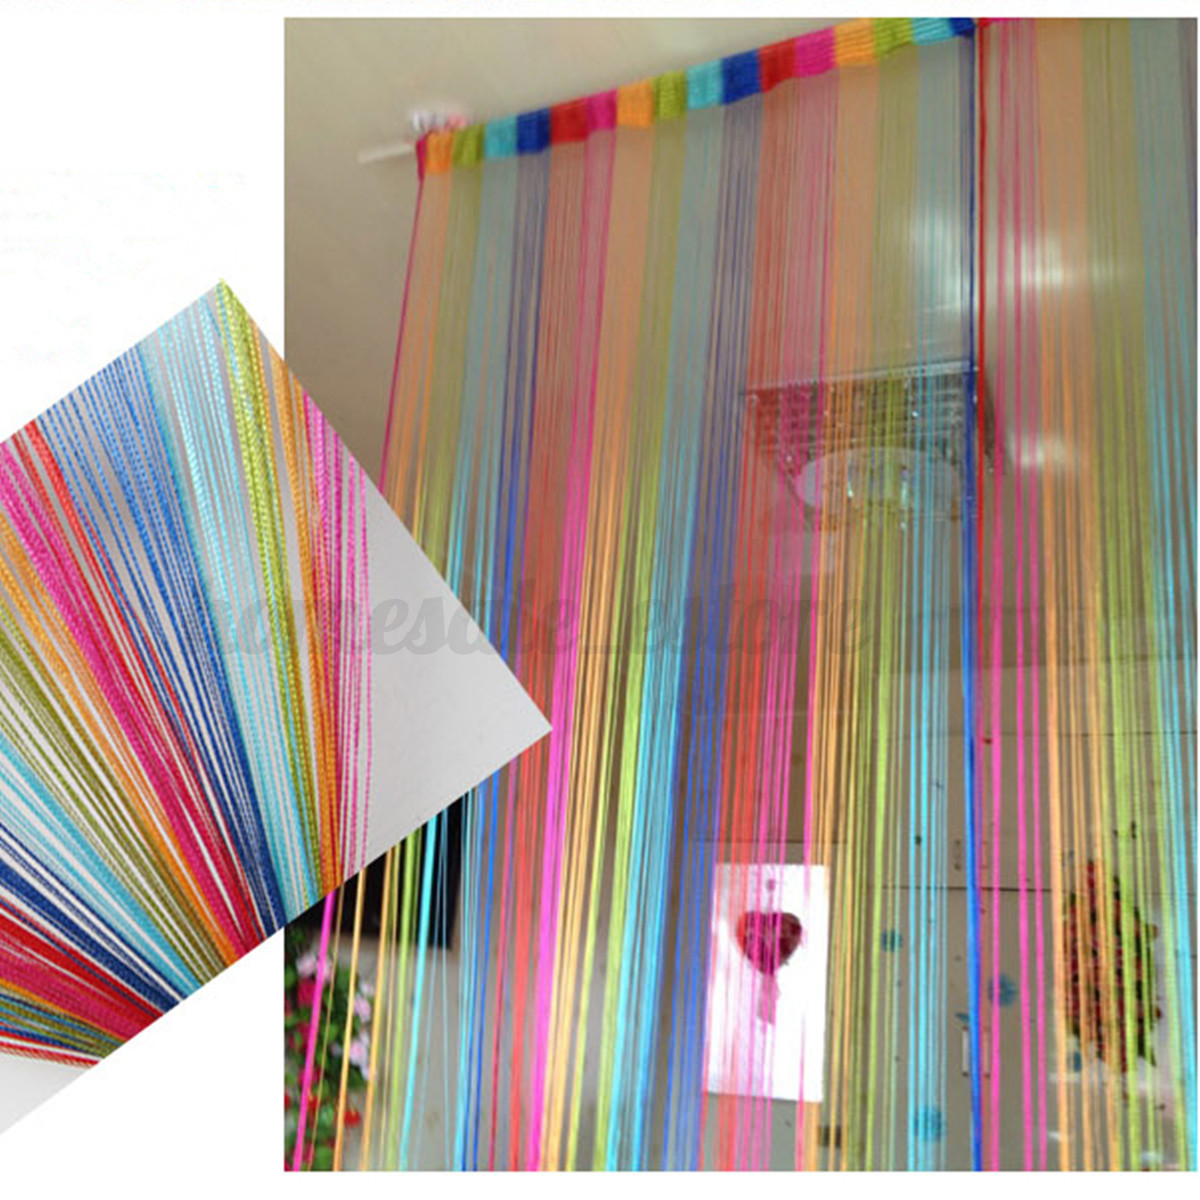 6 1 2 Sips Curtain Wall : M door window fringe wall panel room divider tassel